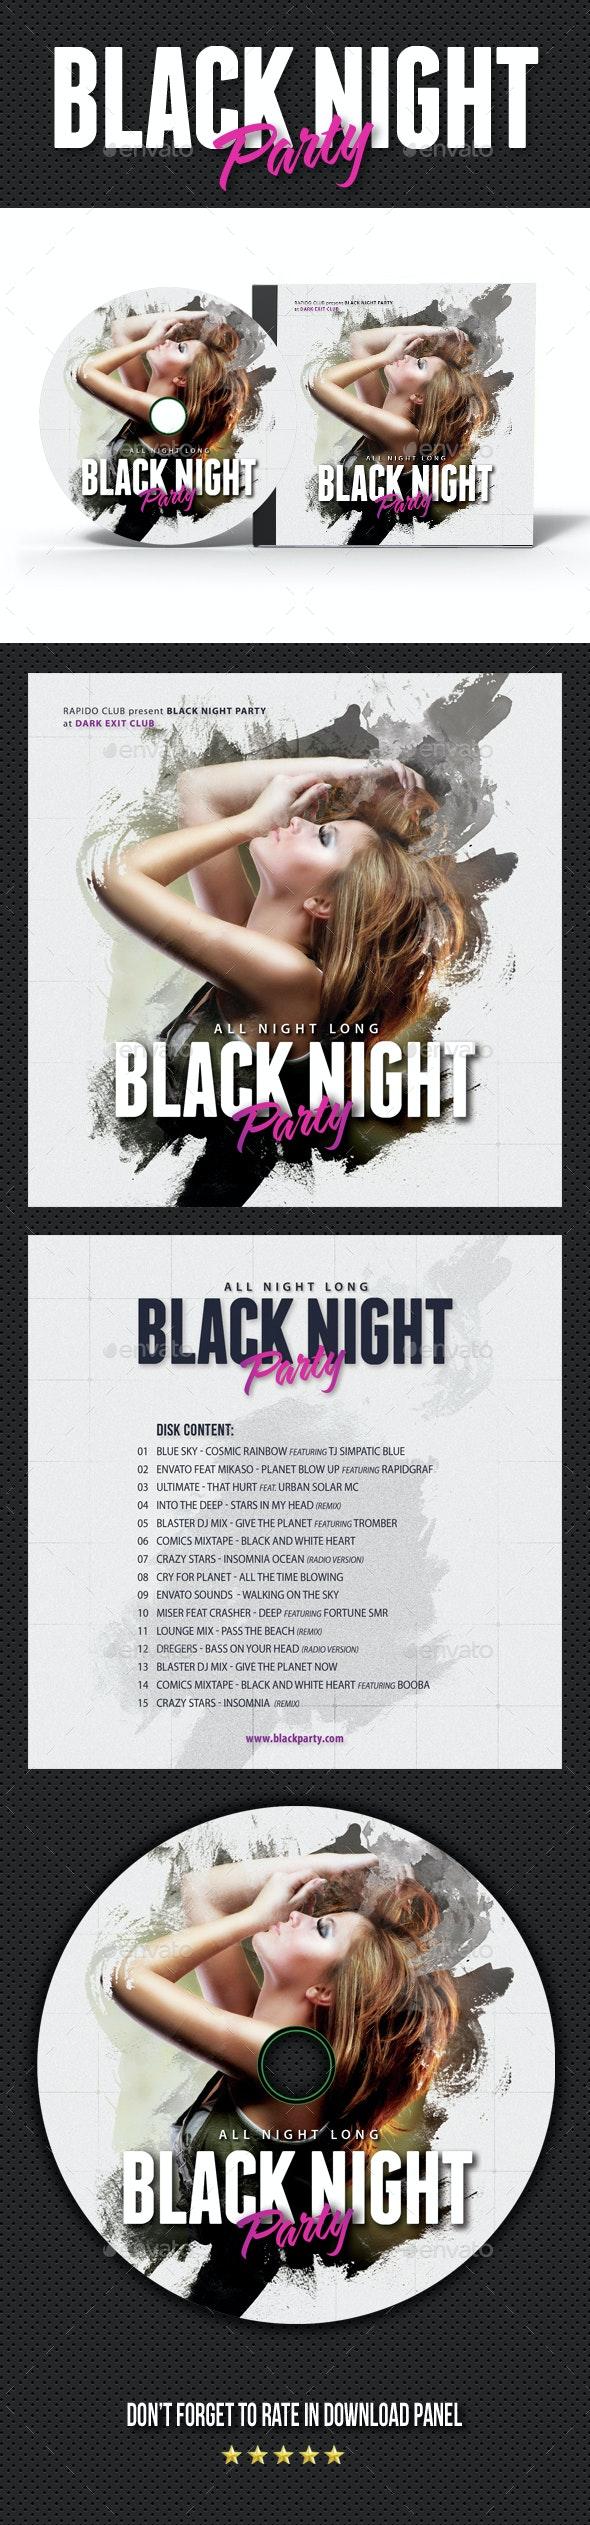 Black Party Event CD Cover Artwork - CD & DVD Artwork Print Templates